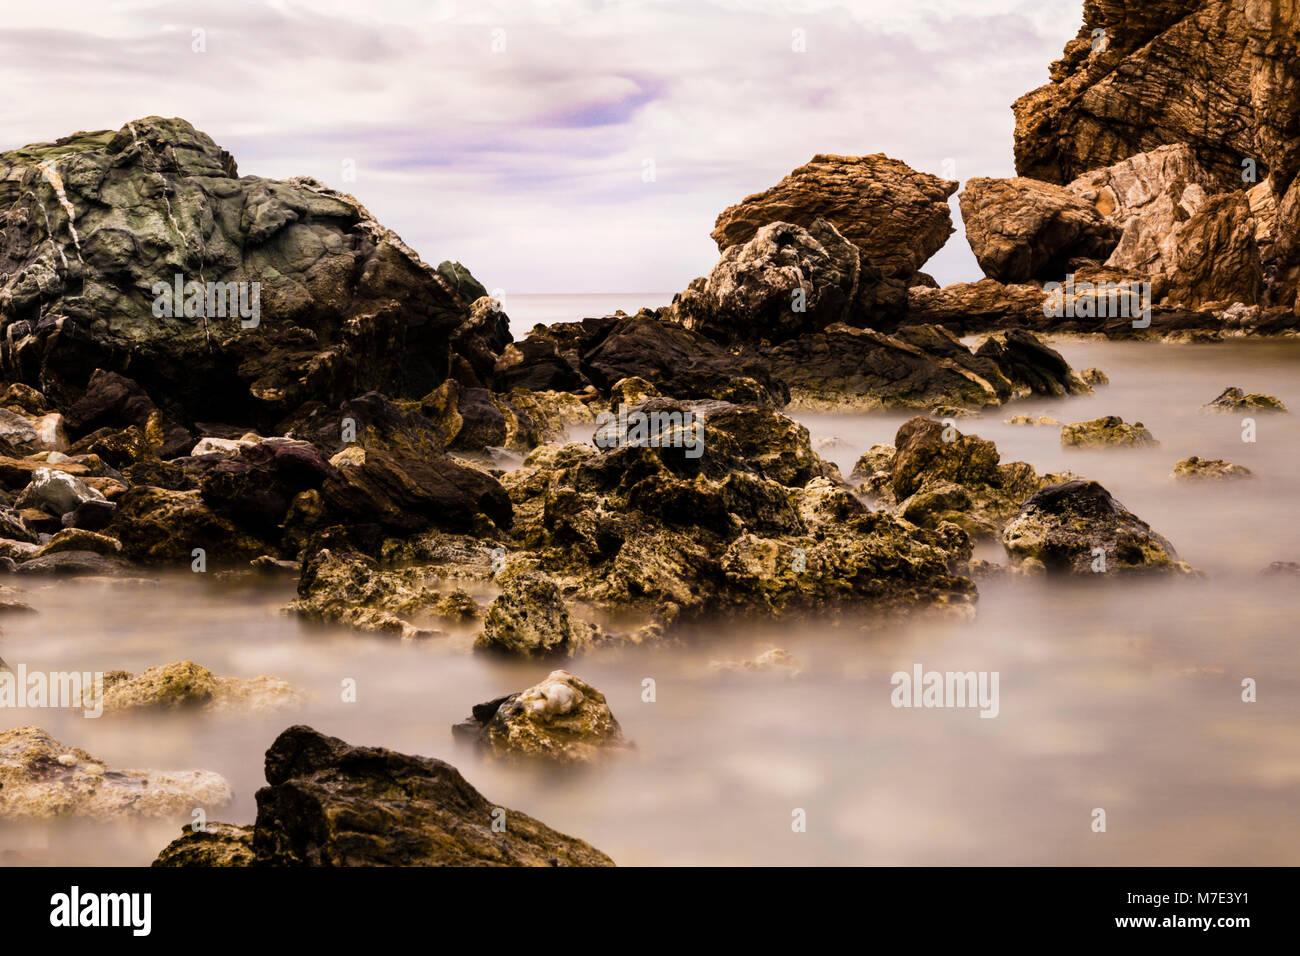 Long exposure of rocky coast in Greece, impressive rock formations on milky waters in sunrise light, landscape format, - Stock Image